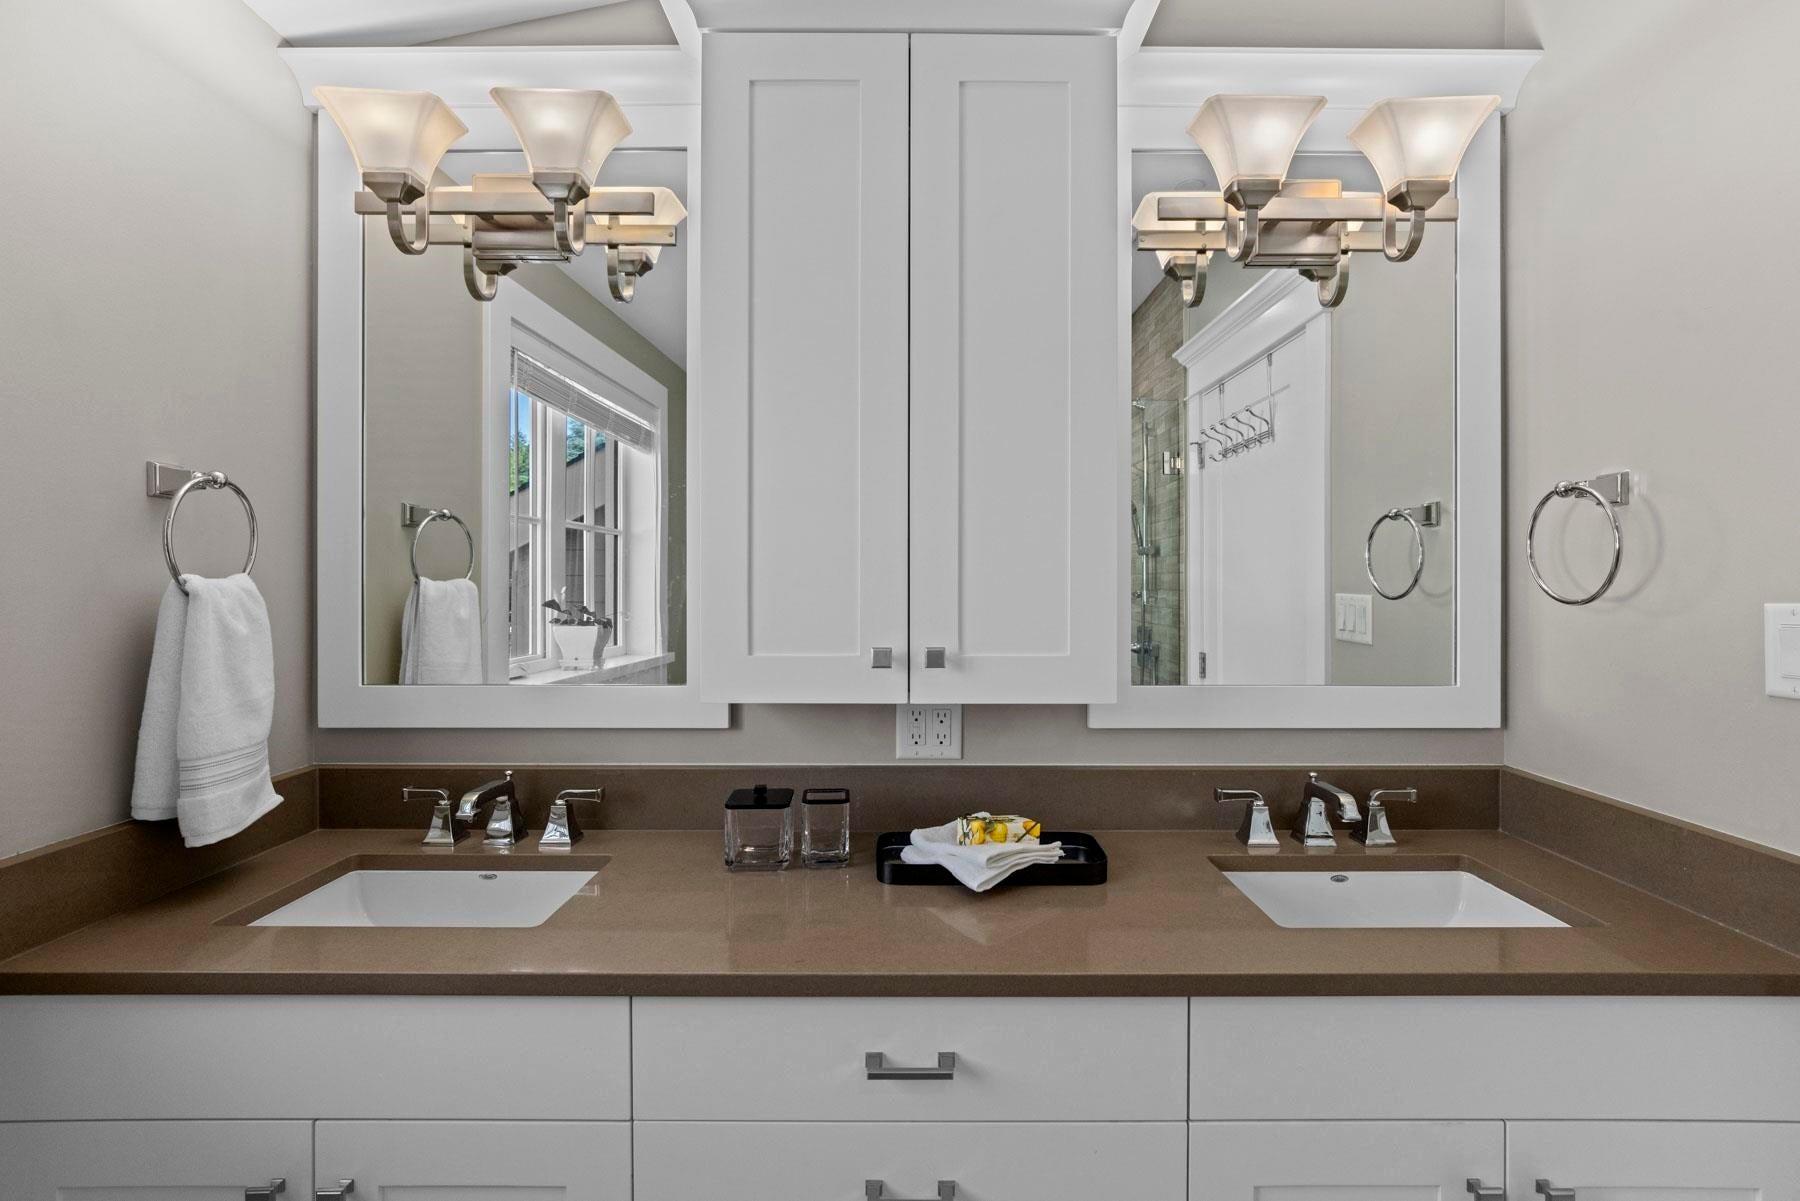 1421 GORDON AVENUE - Ambleside House/Single Family for sale, 3 Bedrooms (R2617756) - #12